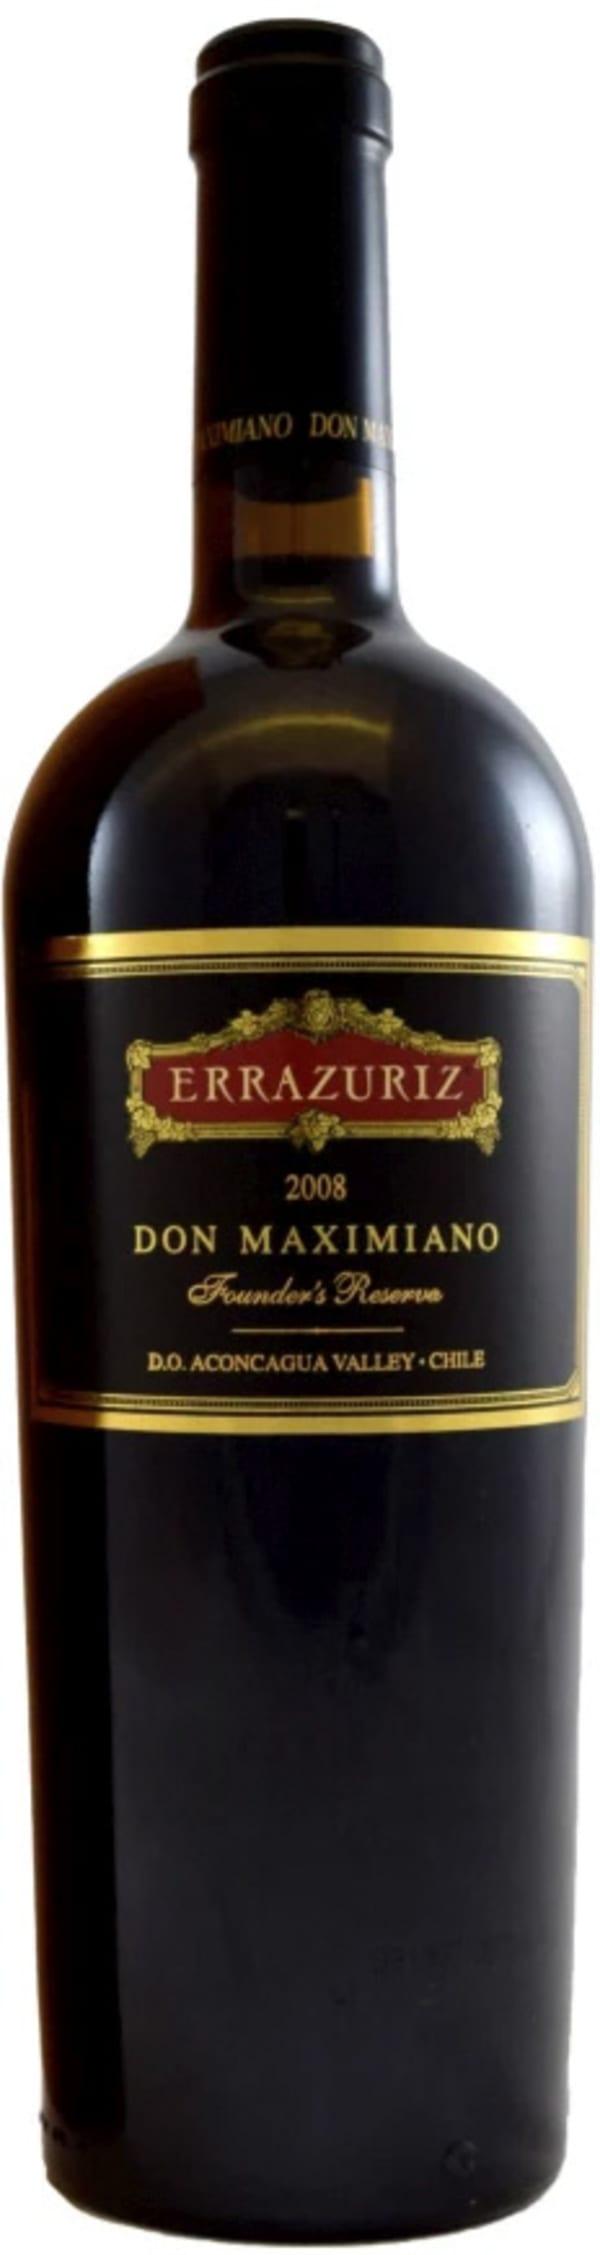 Errazuriz Don Maximiano Founders Reserve 2008